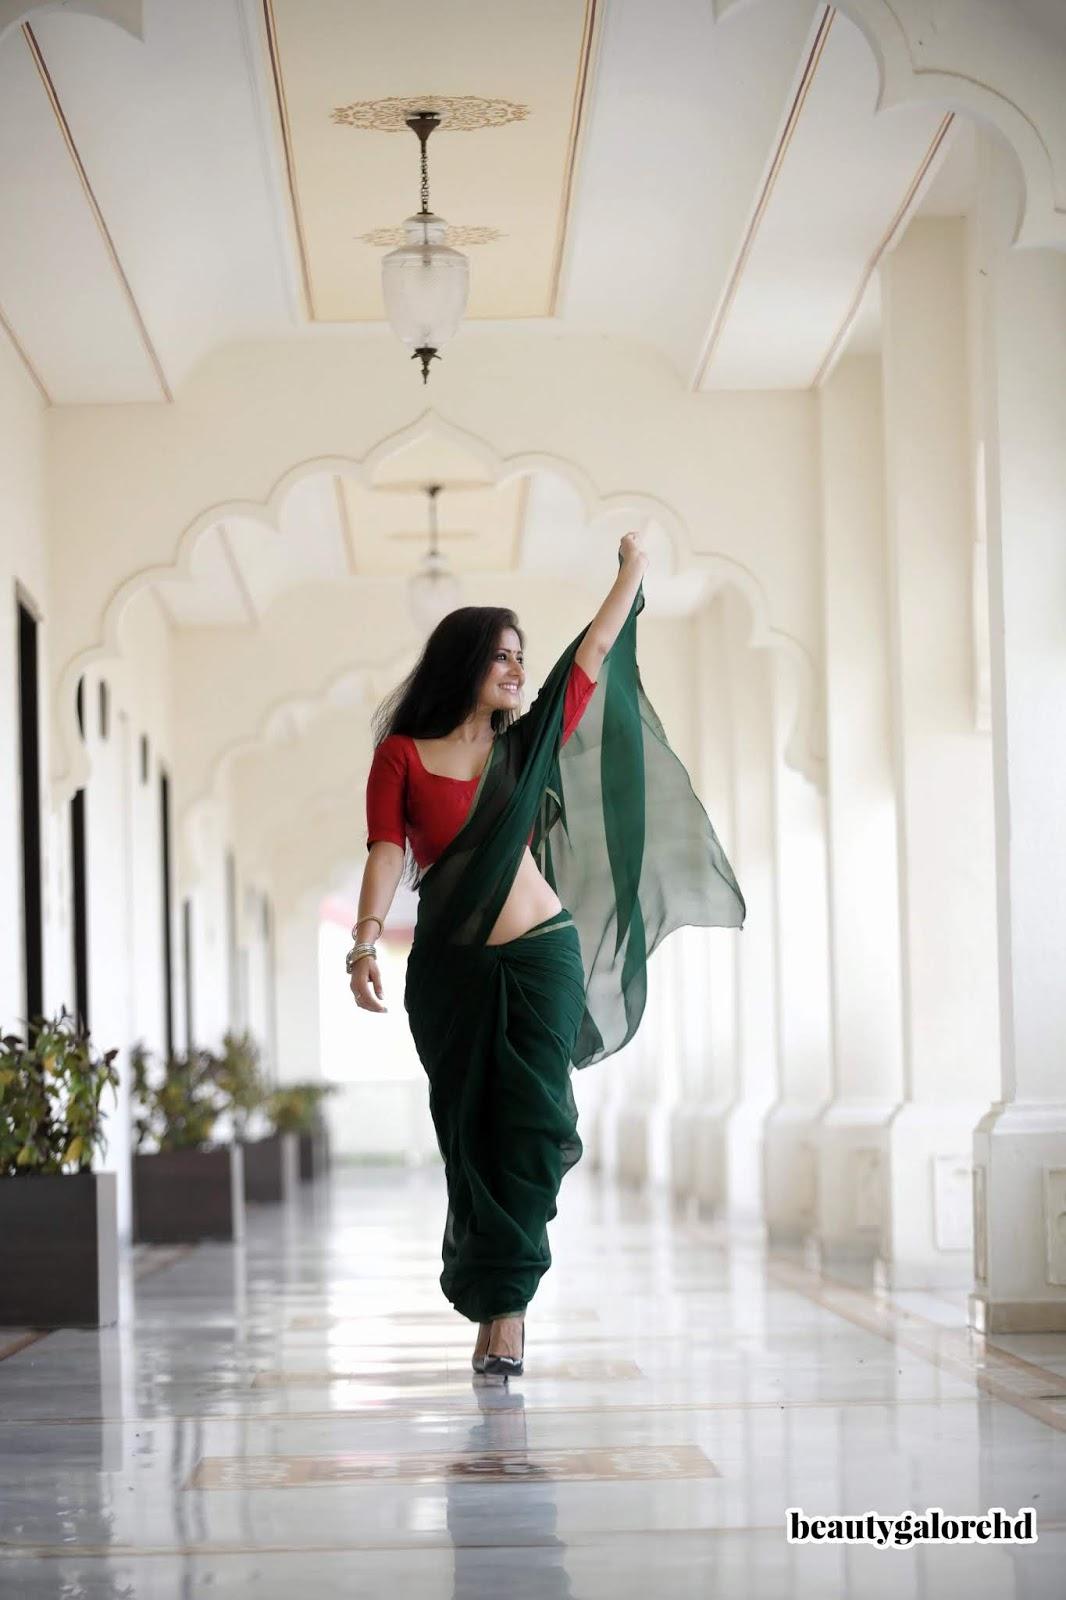 Archanna Gupta Hot Saree Come Back Photoshoot - December 2019